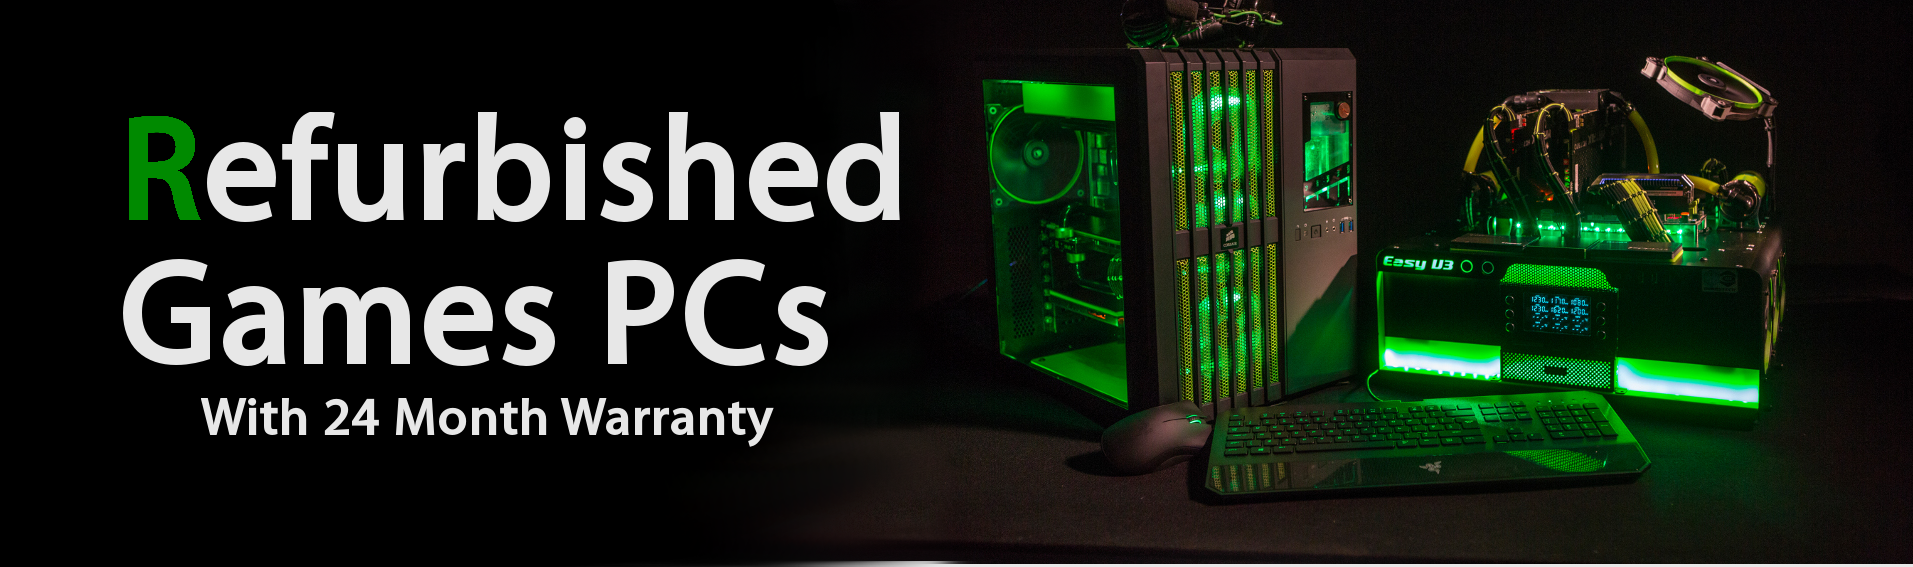 Refurbished games PCs